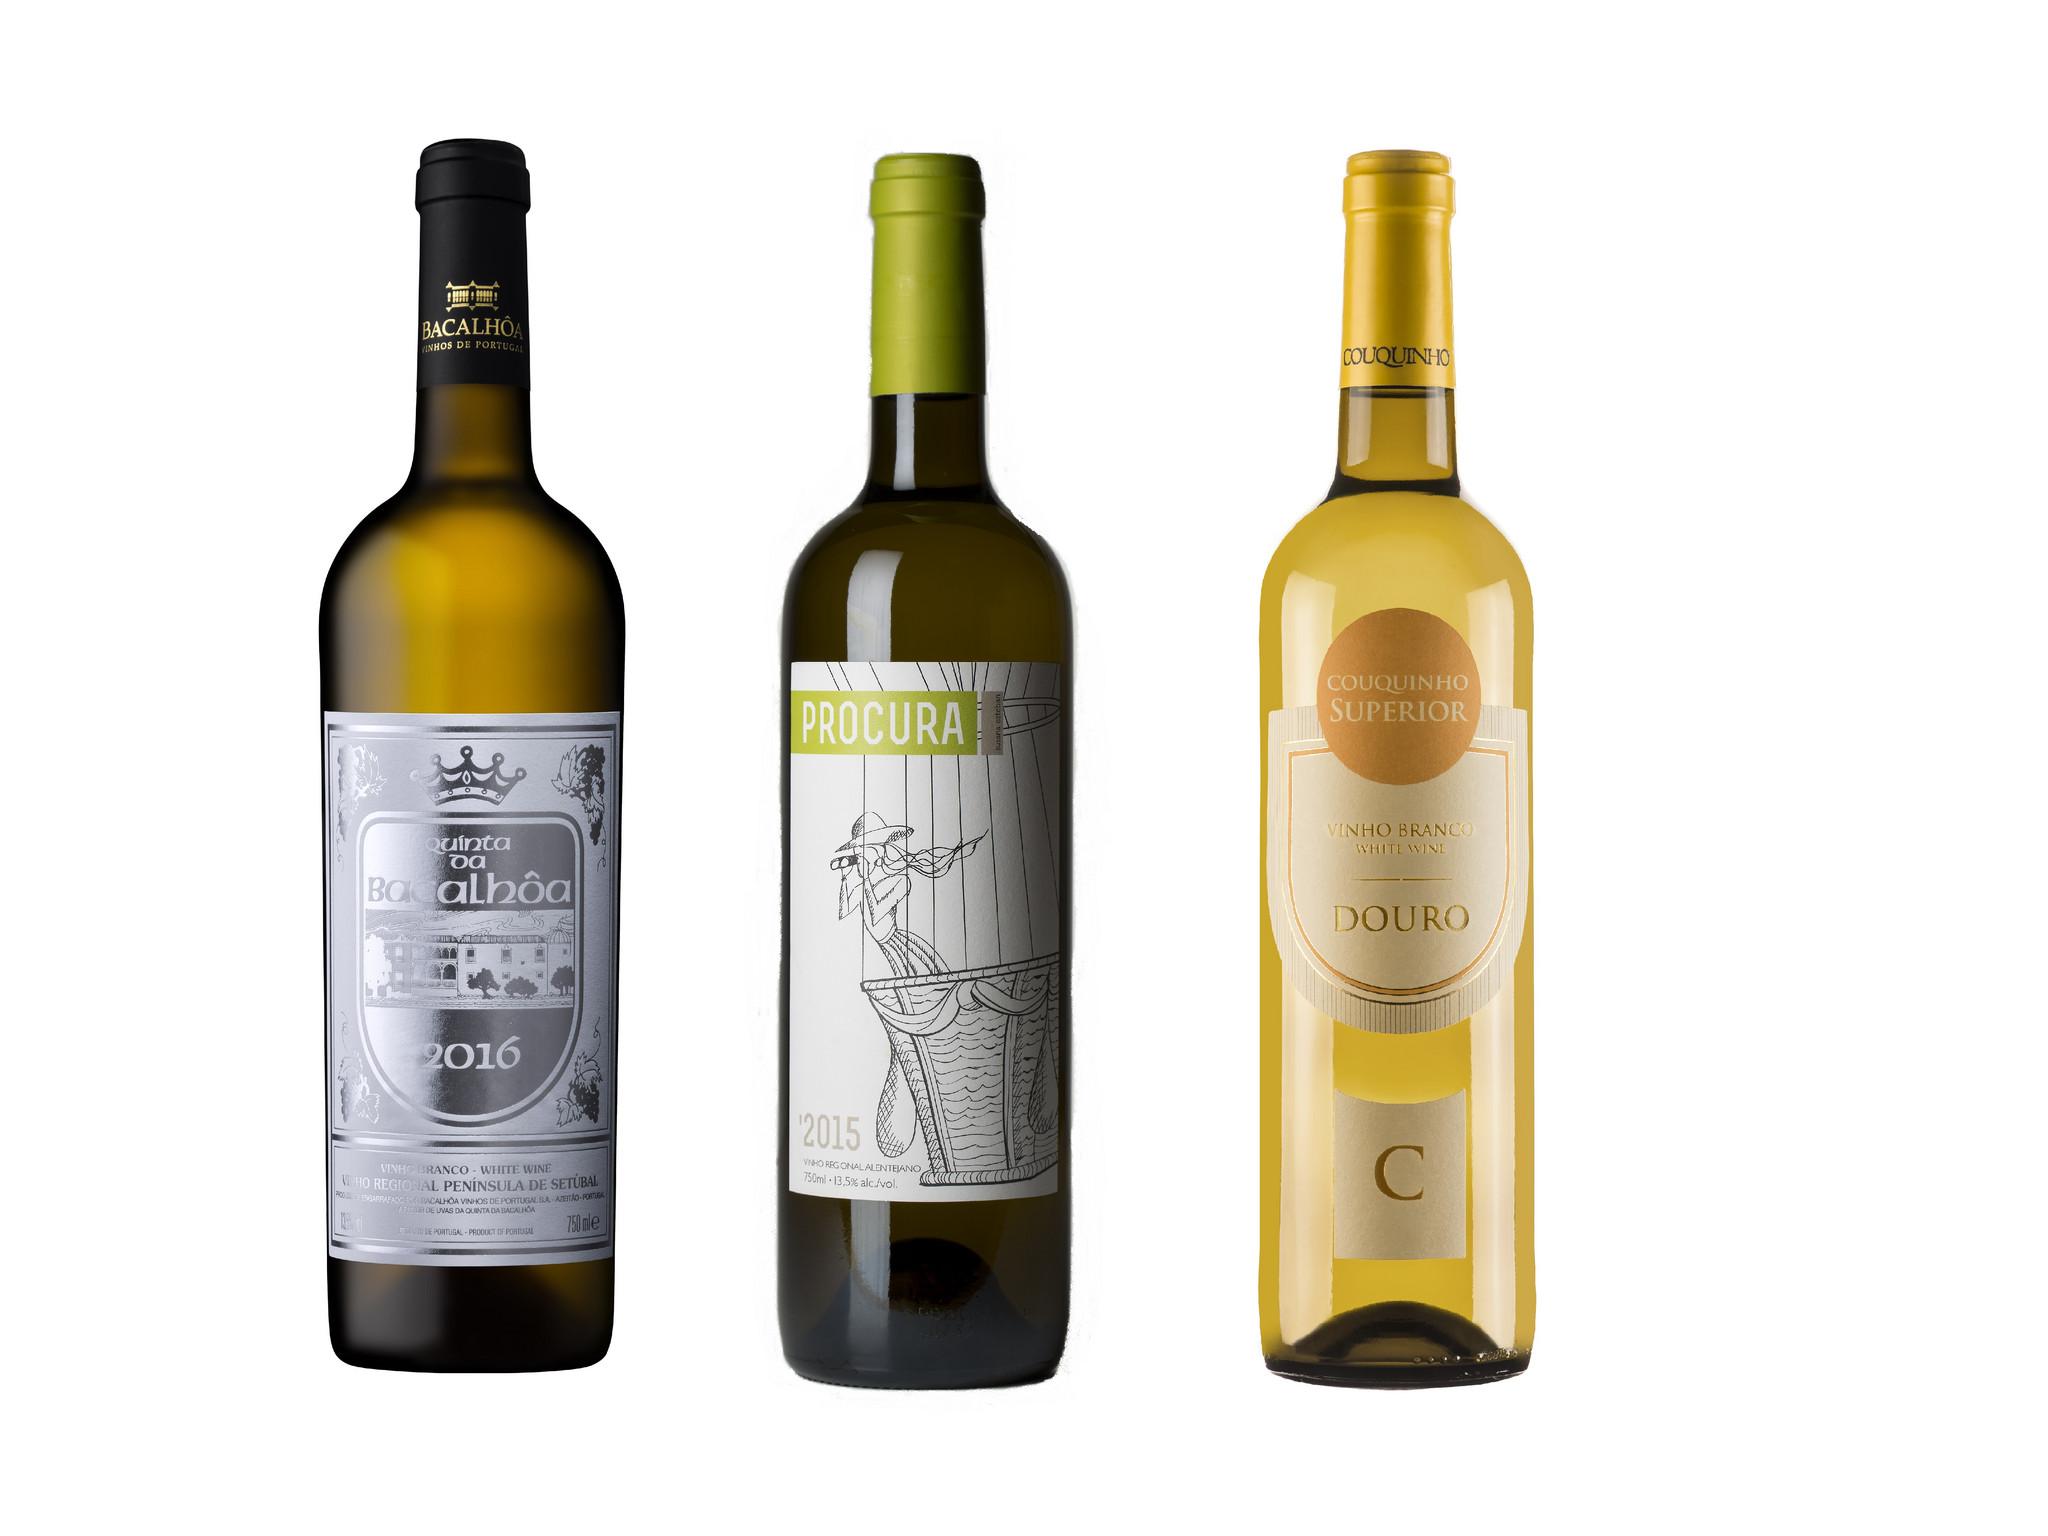 vinhos1281.jpg